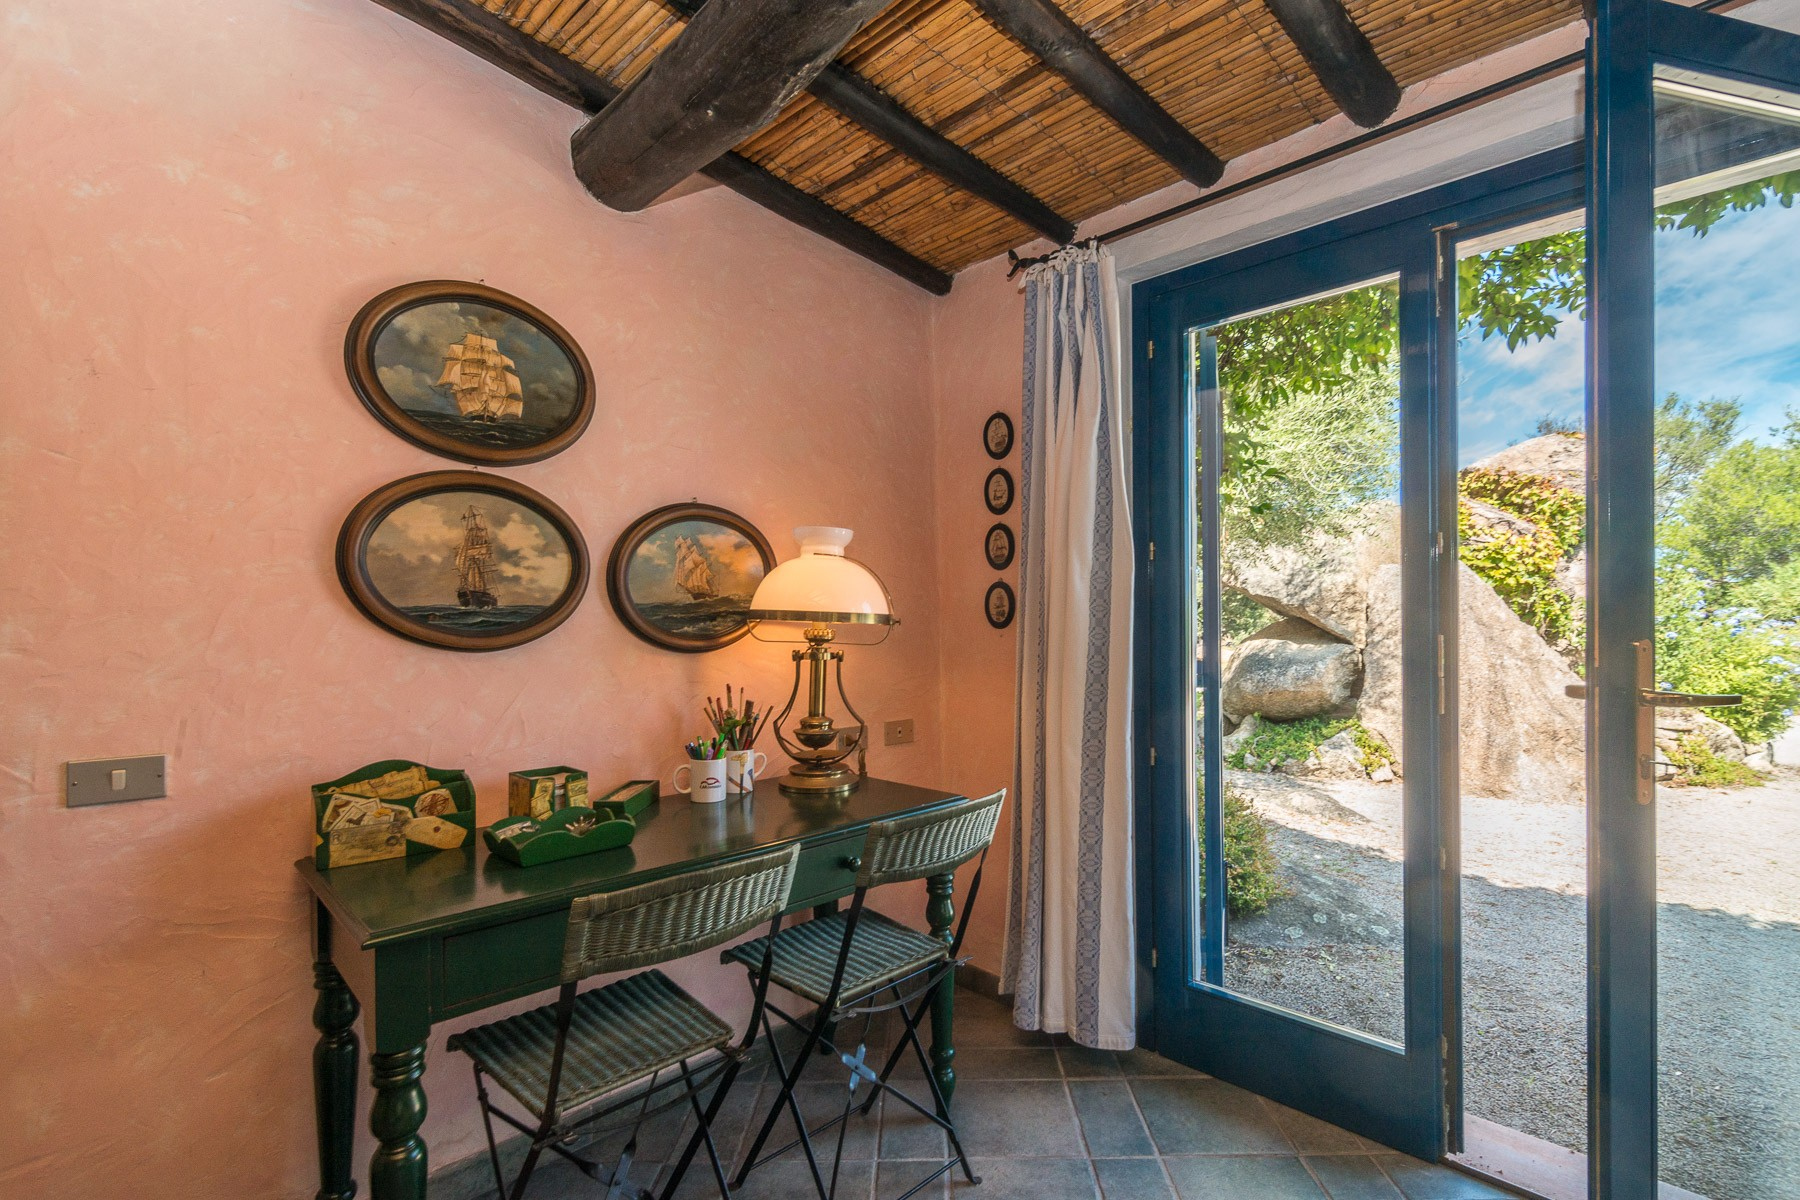 Casa indipendente in Vendita a Olbia: 5 locali, 230 mq - Foto 15